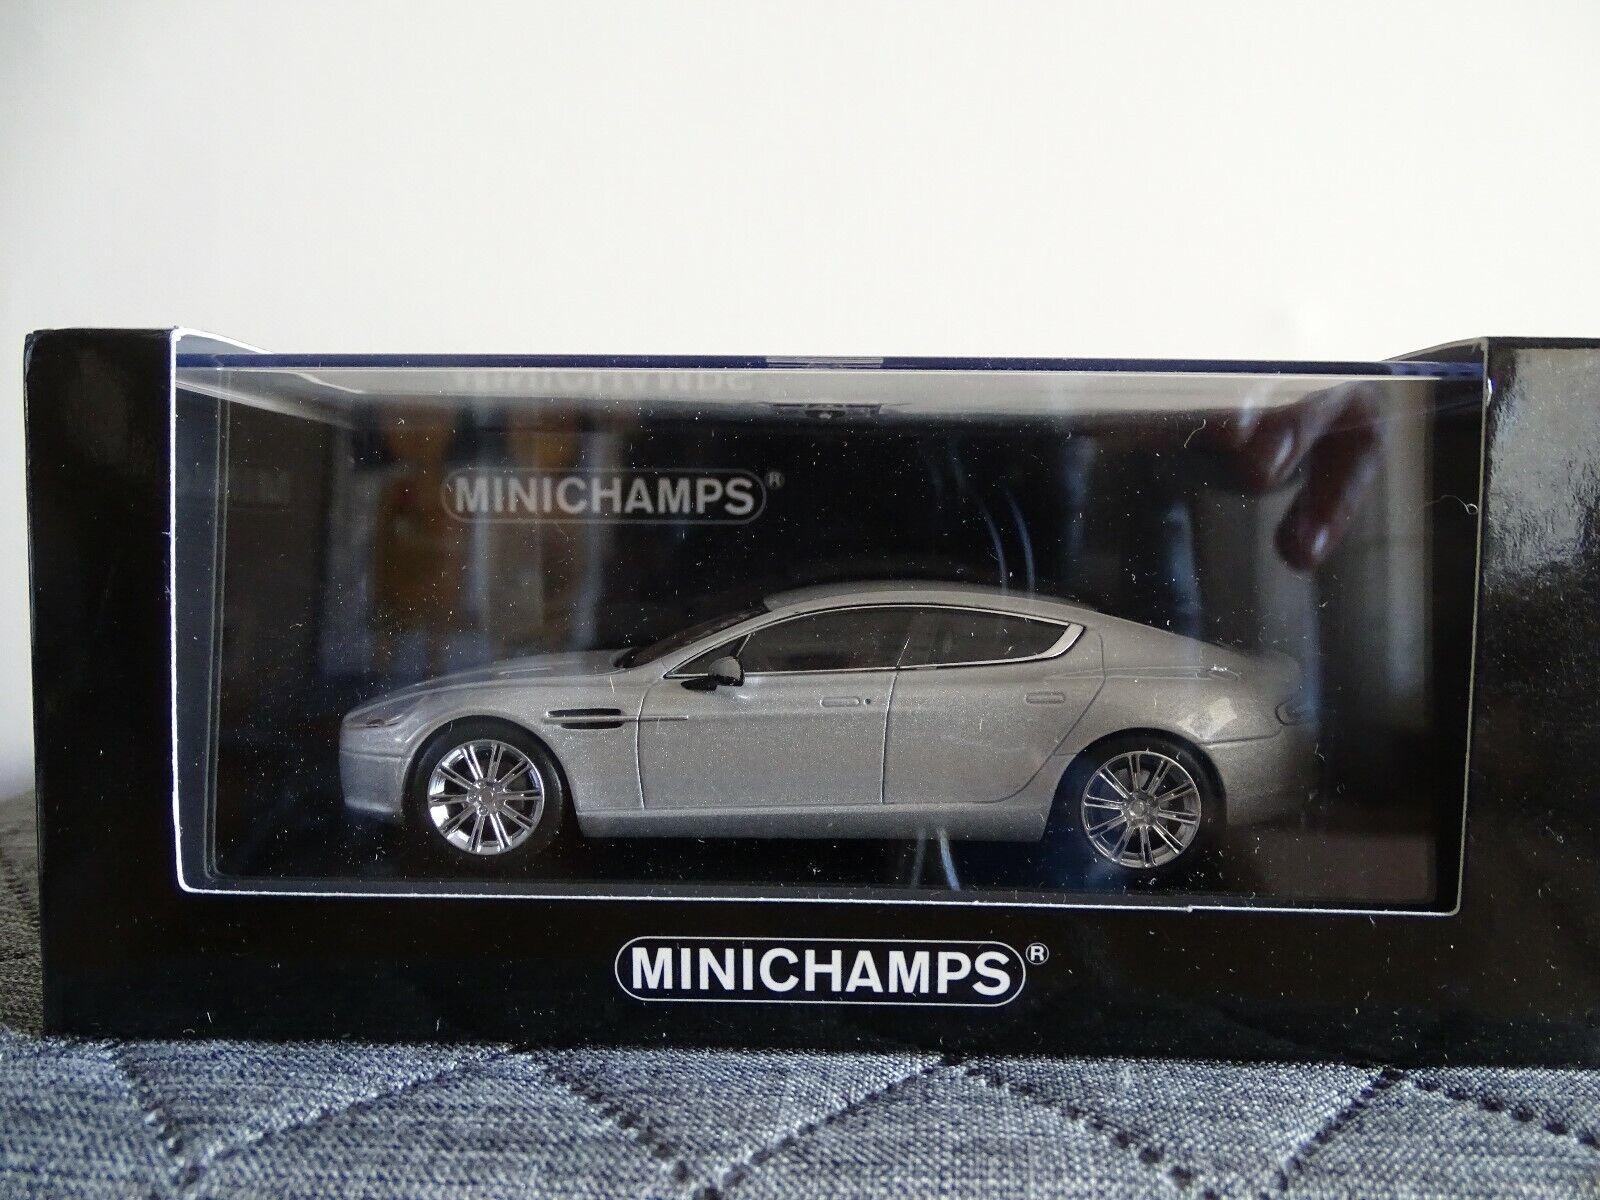 1 43 Minichamps  400137901 2010 Aston Martin Rapide argento Limitado Edt.   Nuevo